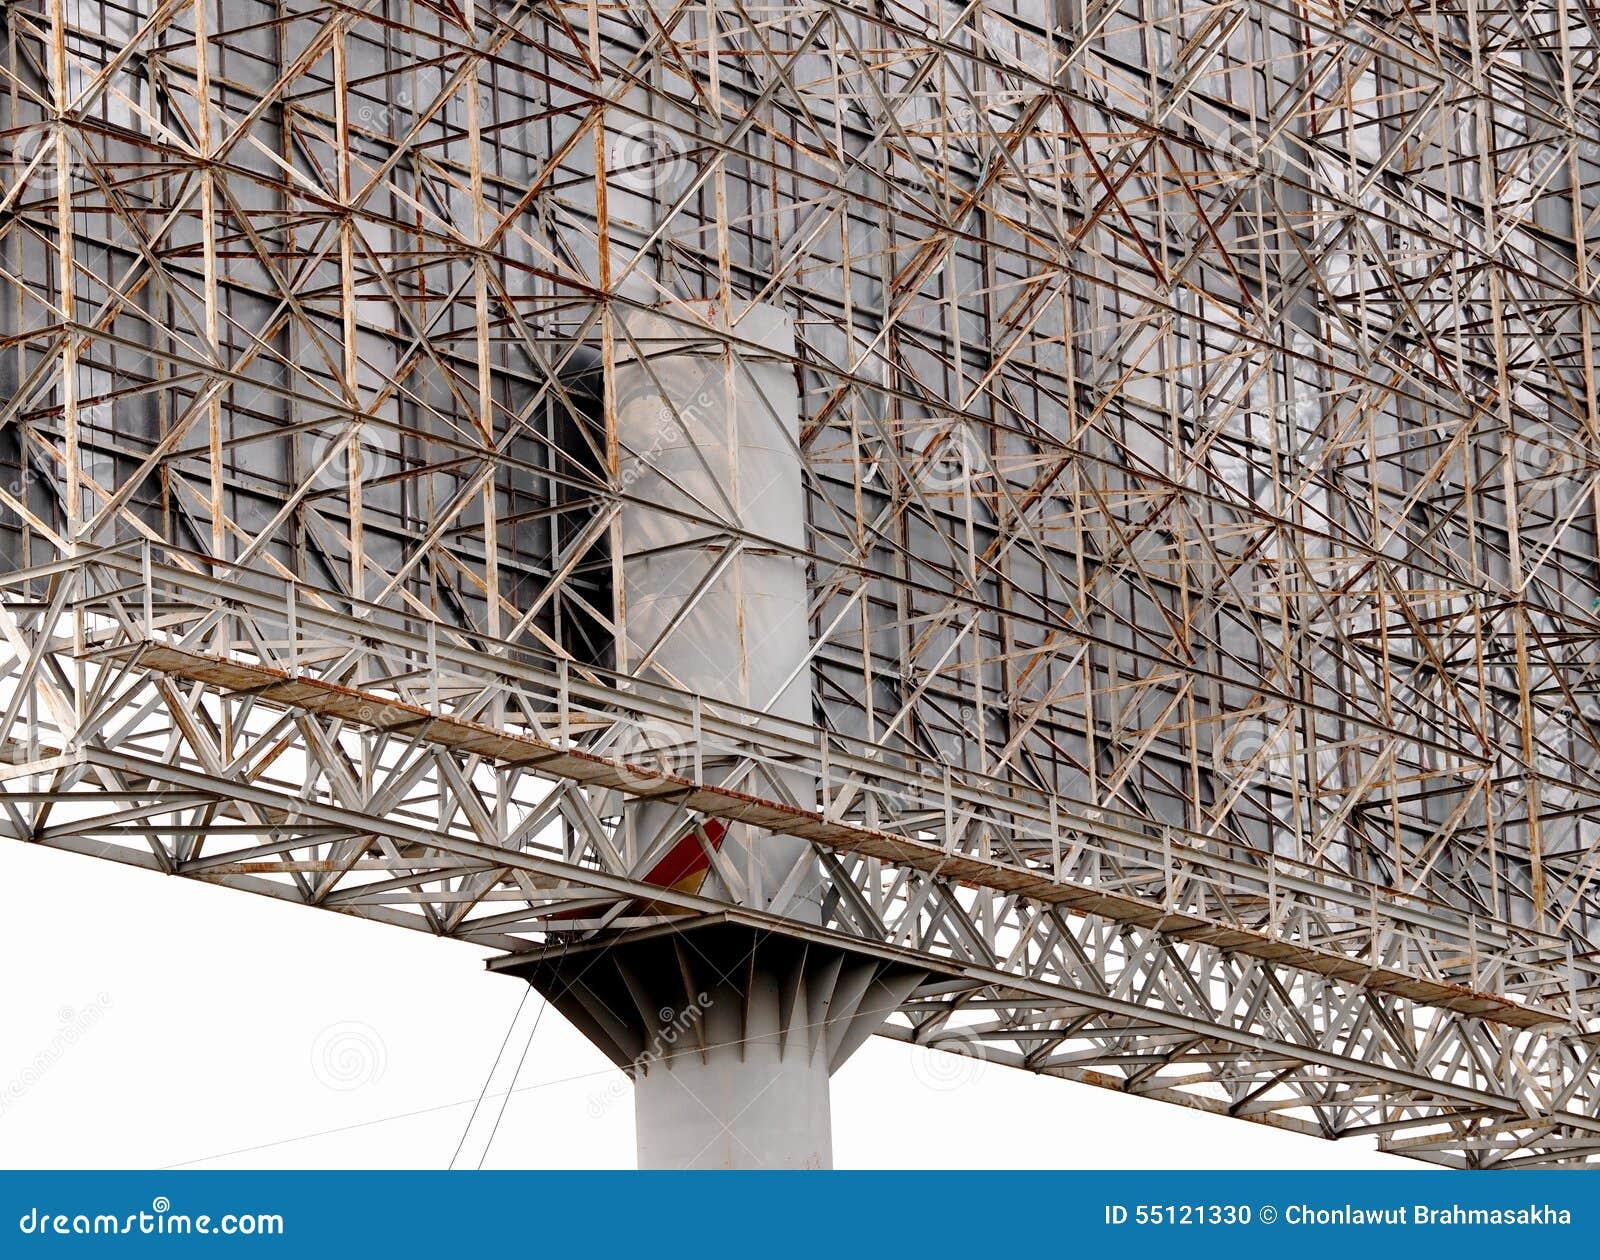 Rigid Steel Frame Construction Detail : Bill board stock photo image